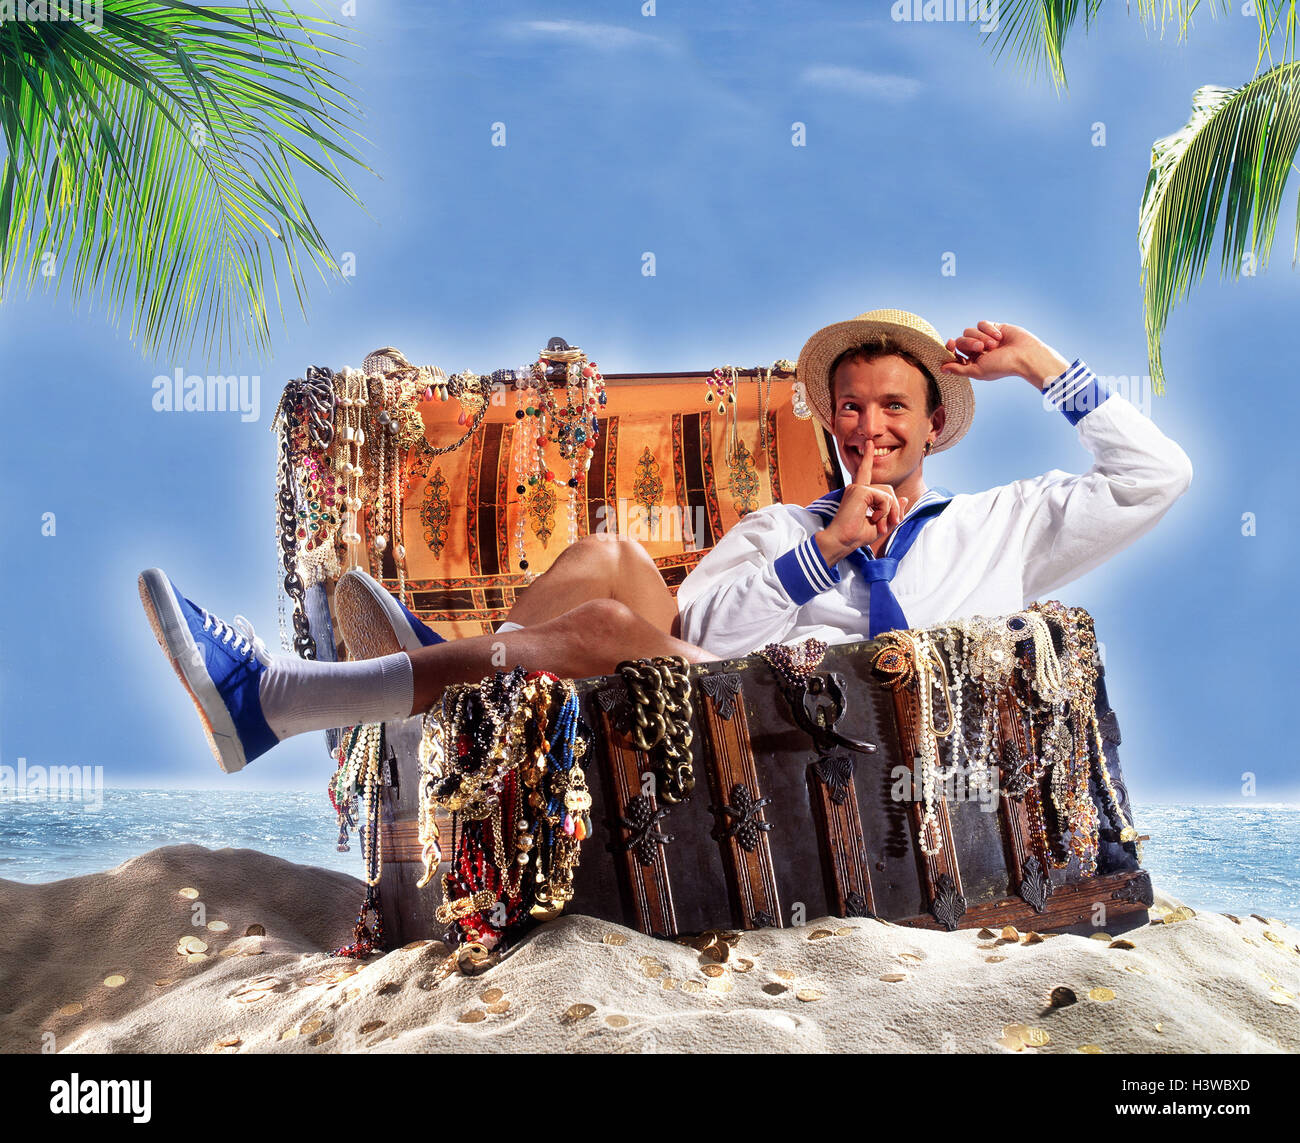 beach-sailor-treasure-chest-sit-gesture-